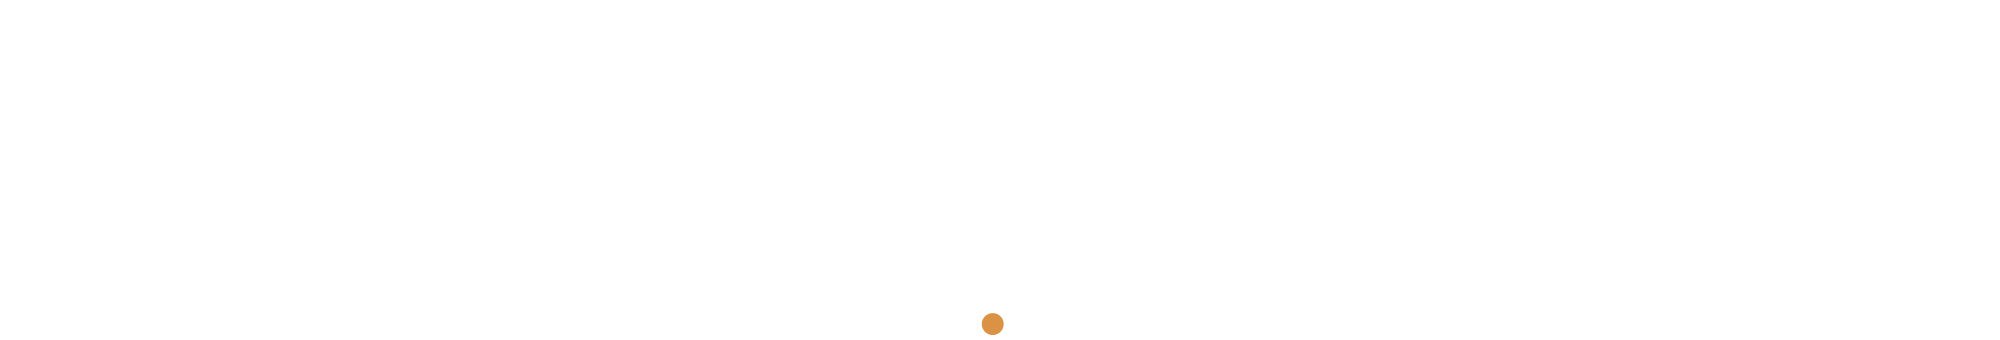 Clavister tagline logo white